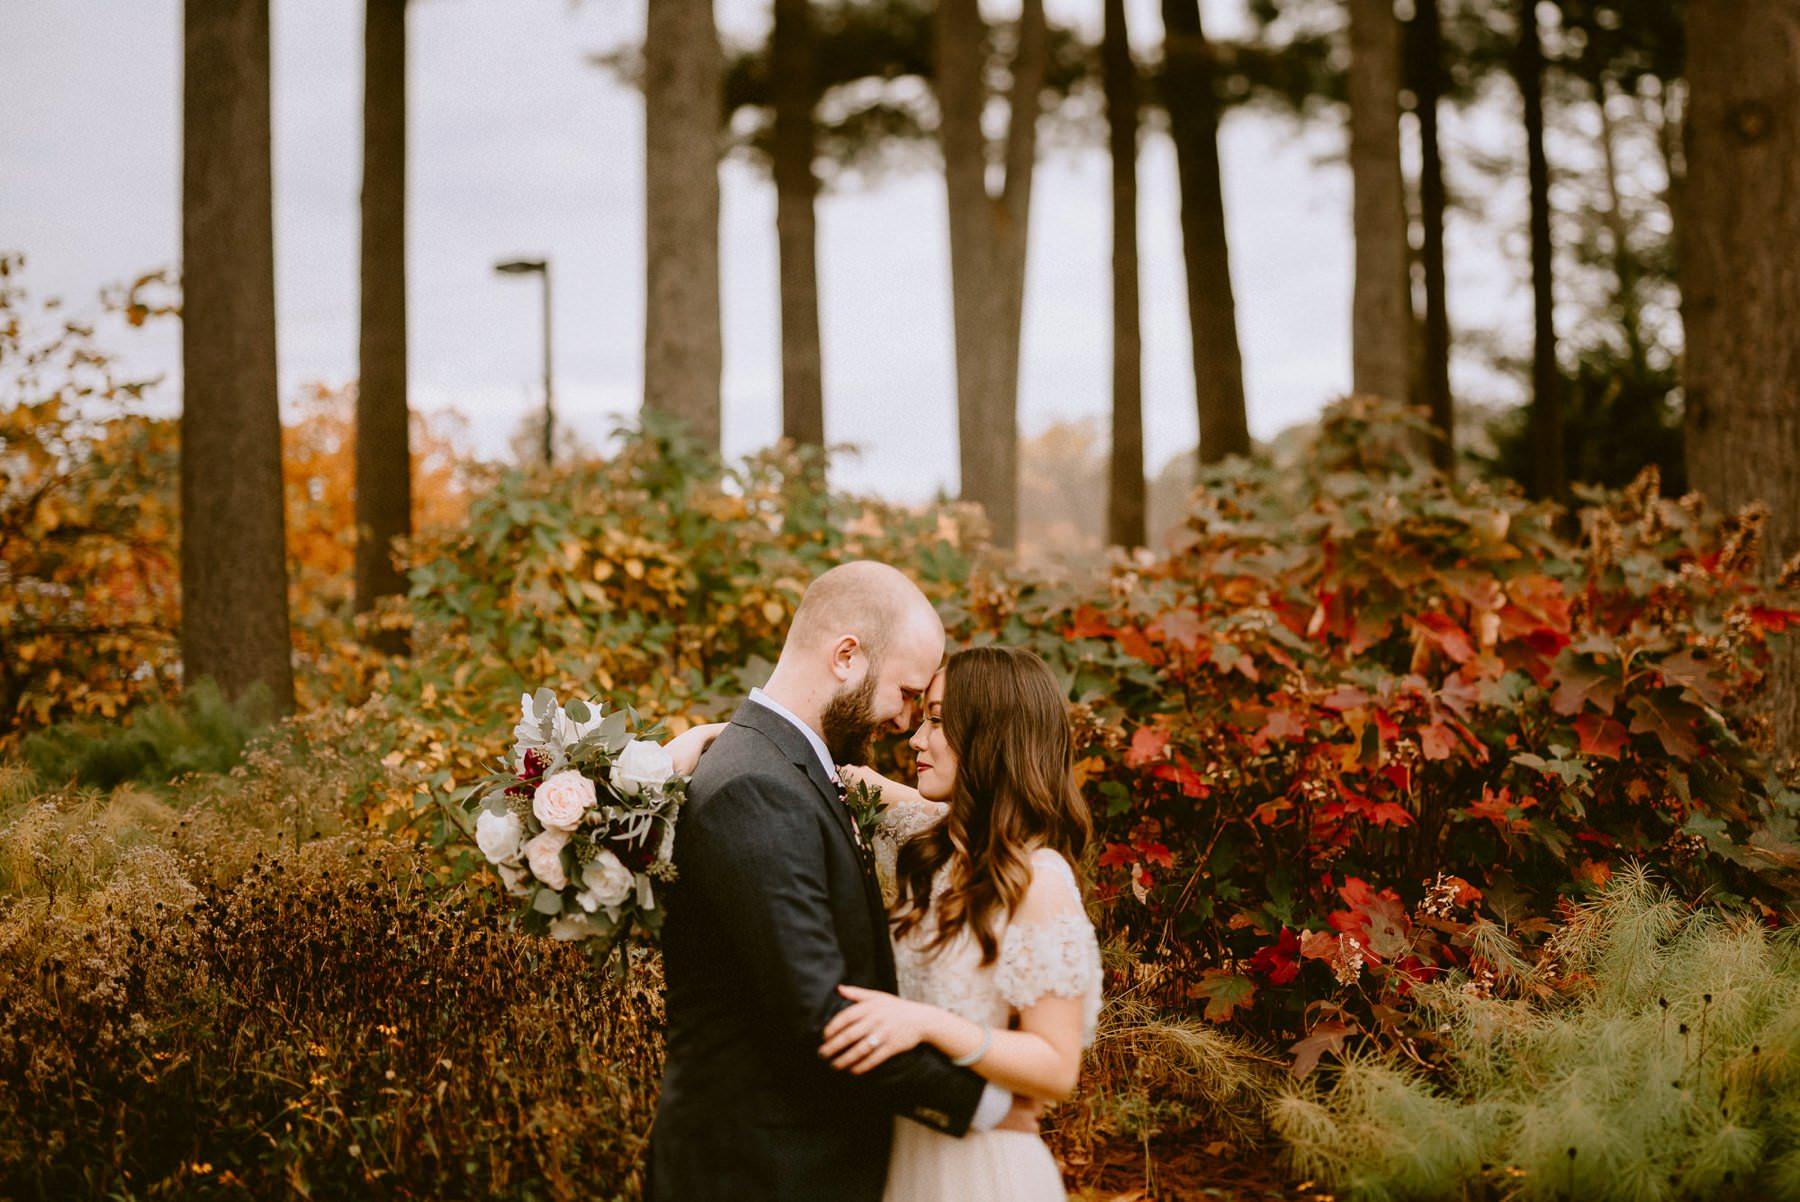 Tyler_arboretum_wedding-038.jpg